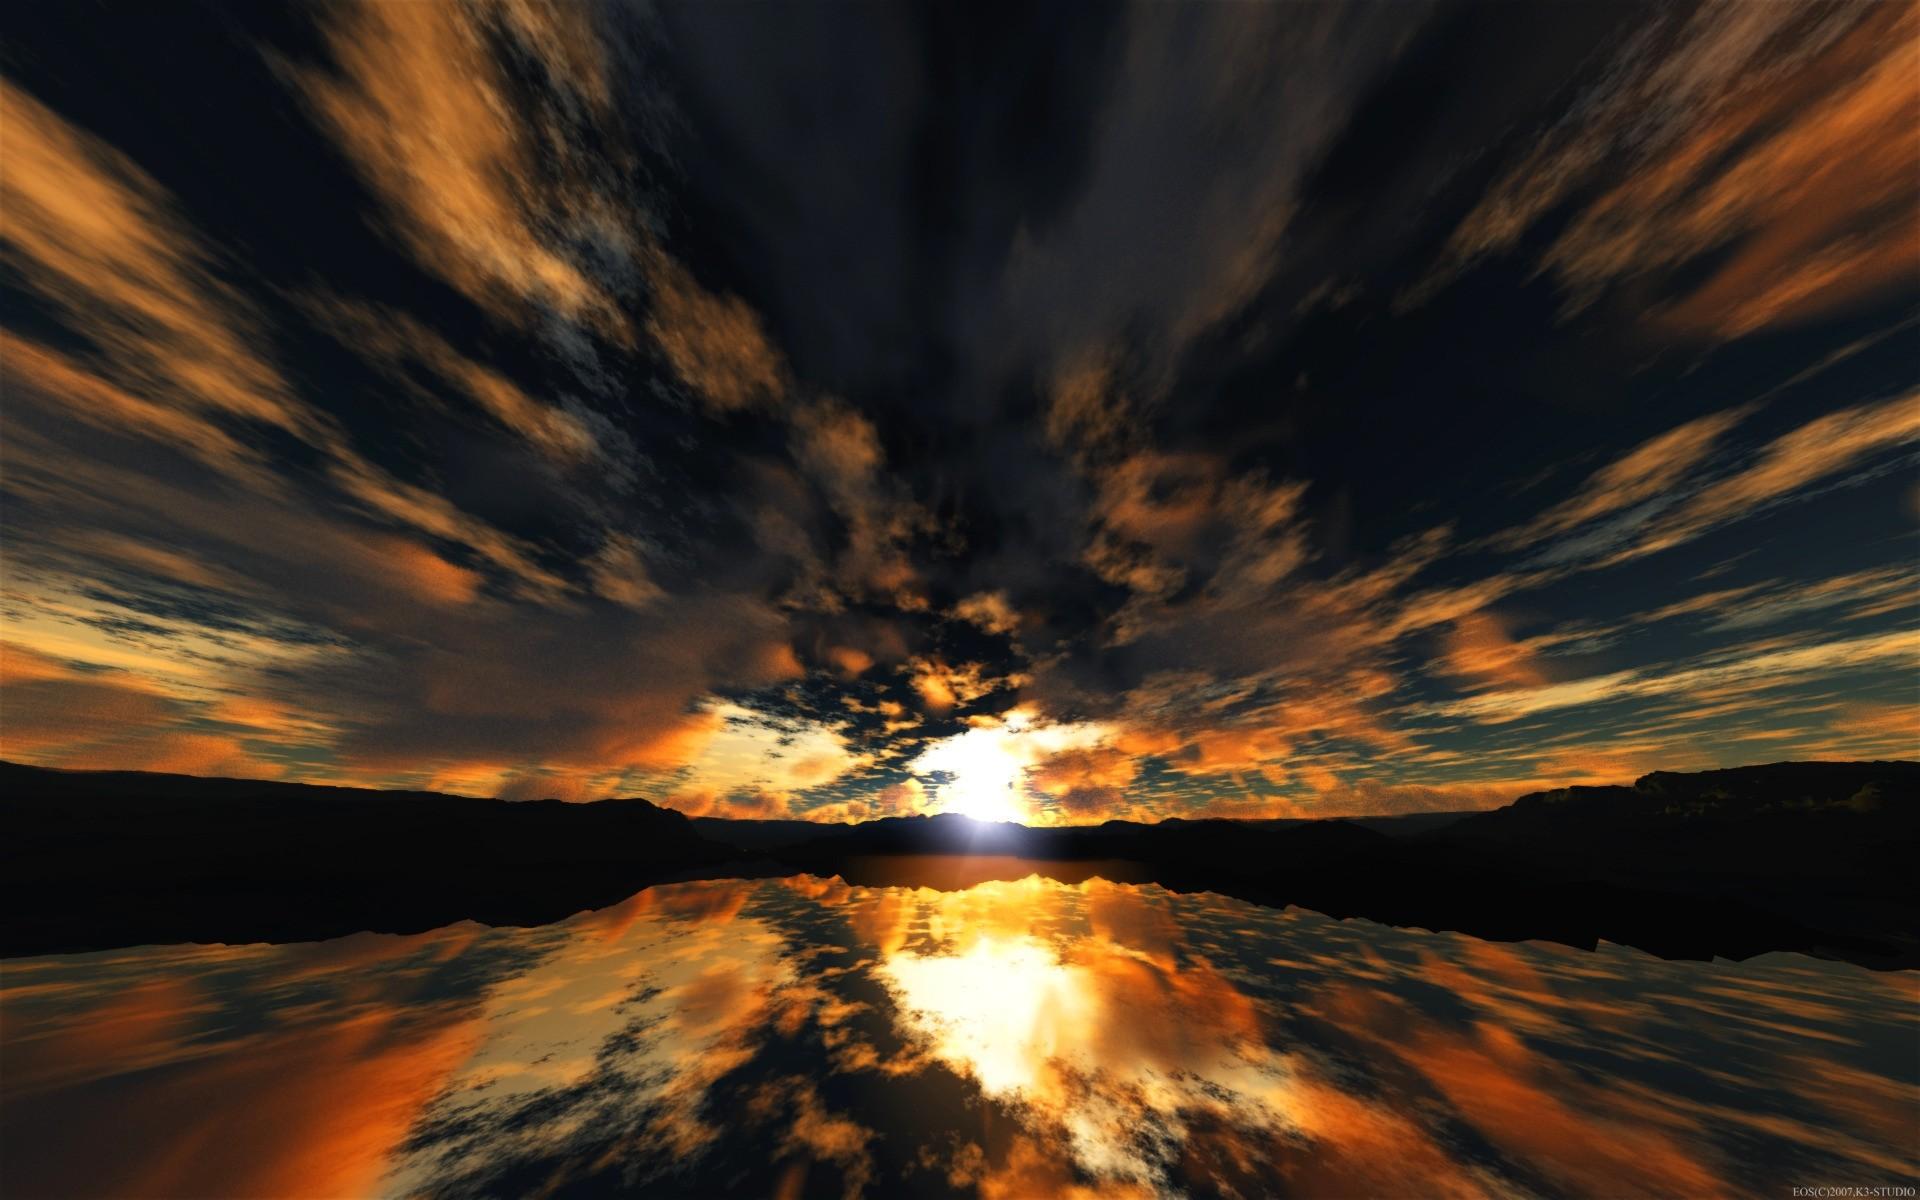 Sky: Light Angry Clouds Reflection Ocean Weird Mountain Sky ...